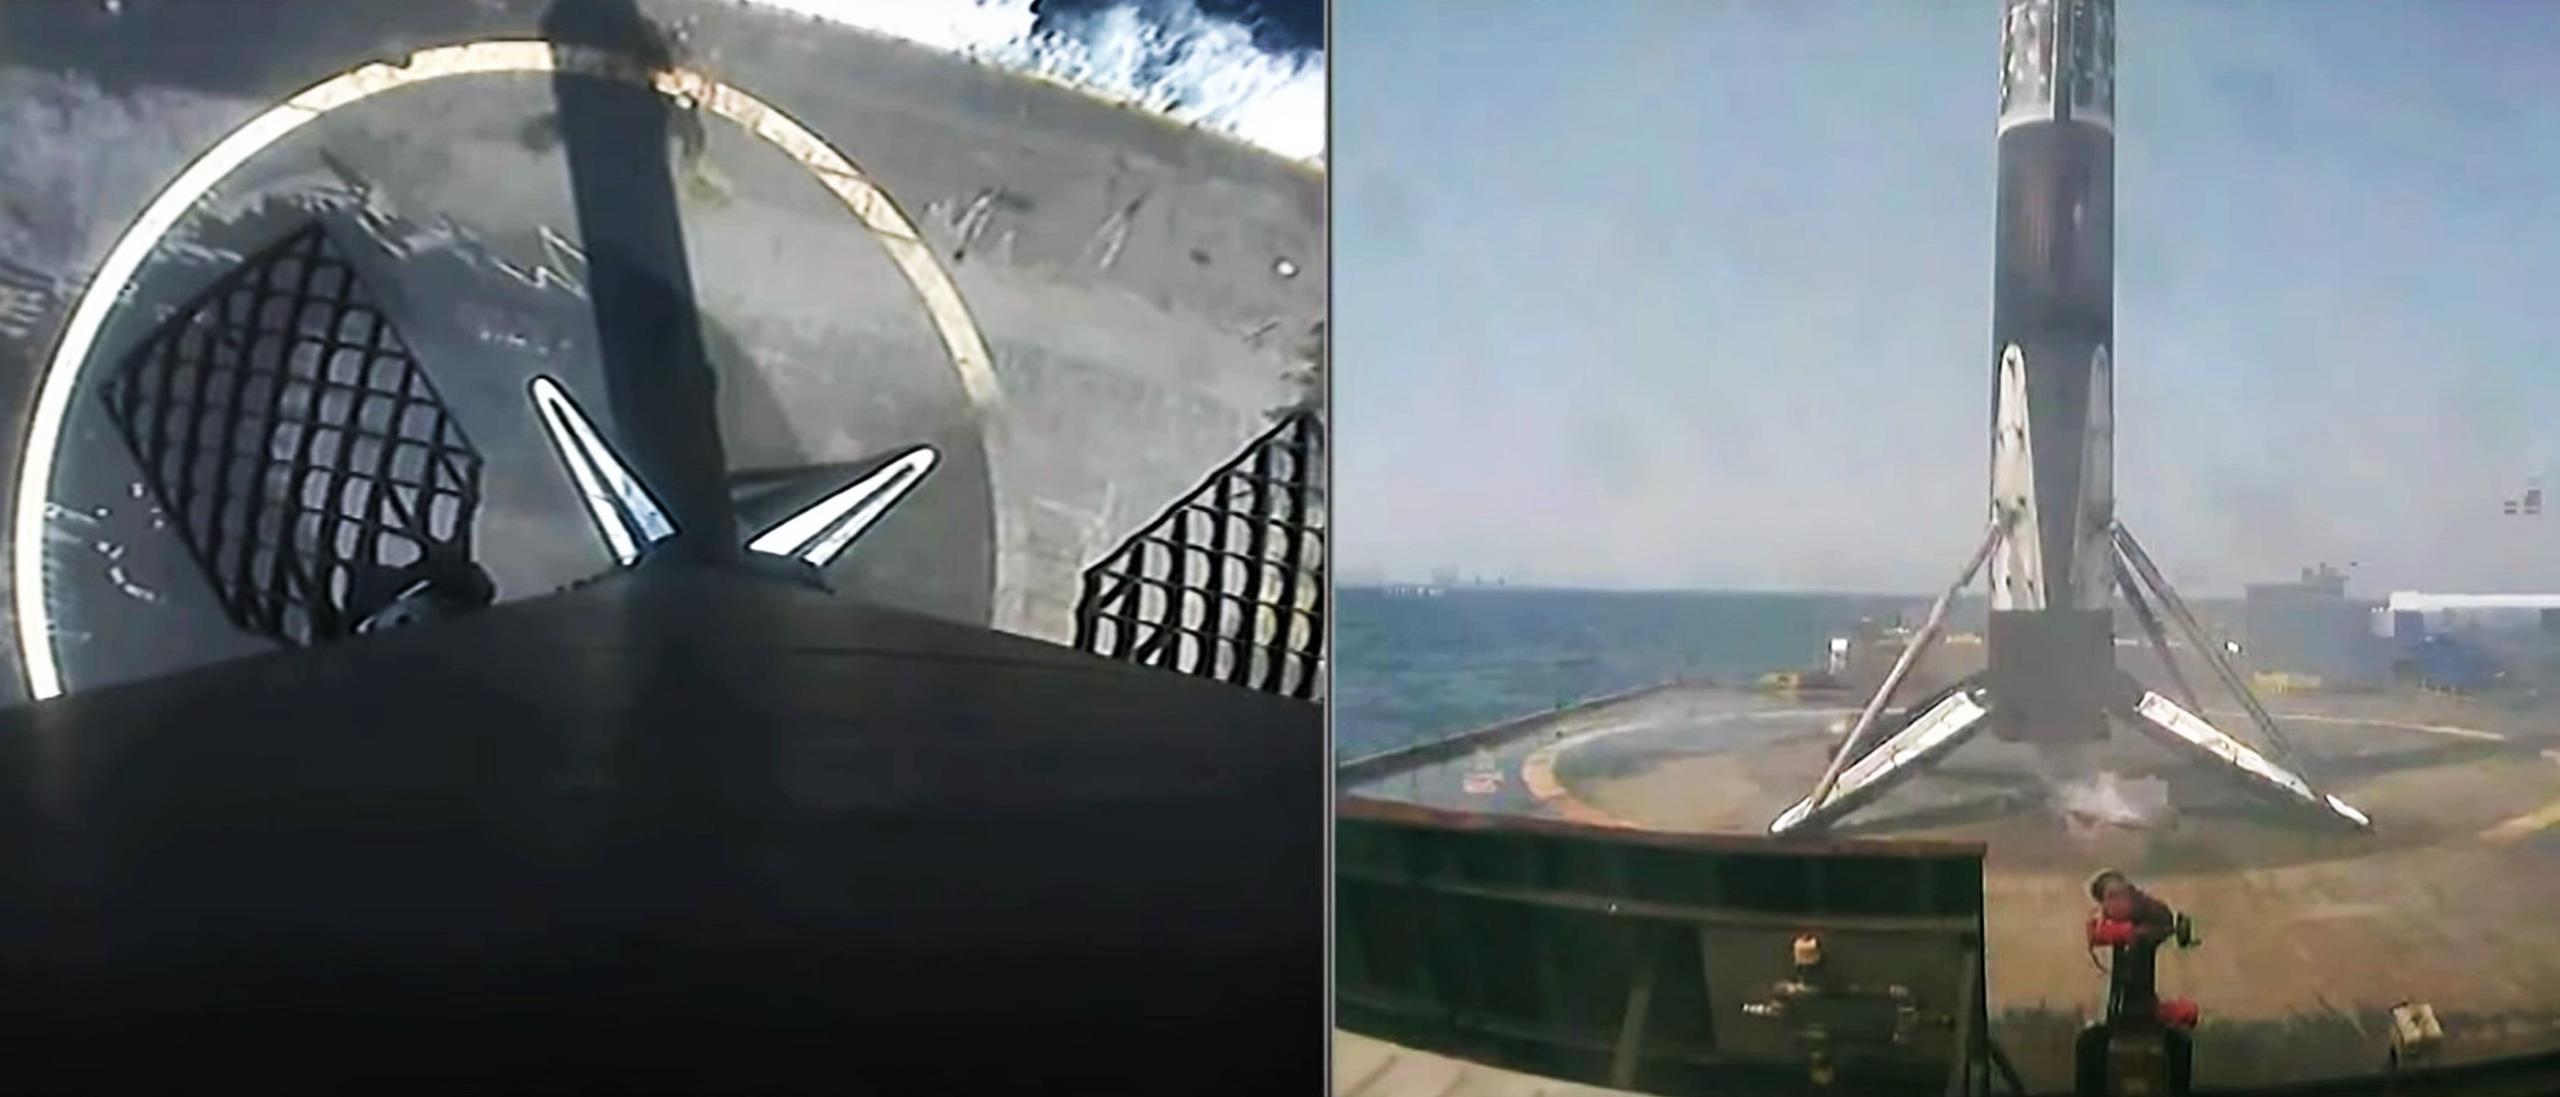 Starlink-23 Falcon 9 B1058 LC-40 040721 webcast (SpaceX) landing 2 edit (c)